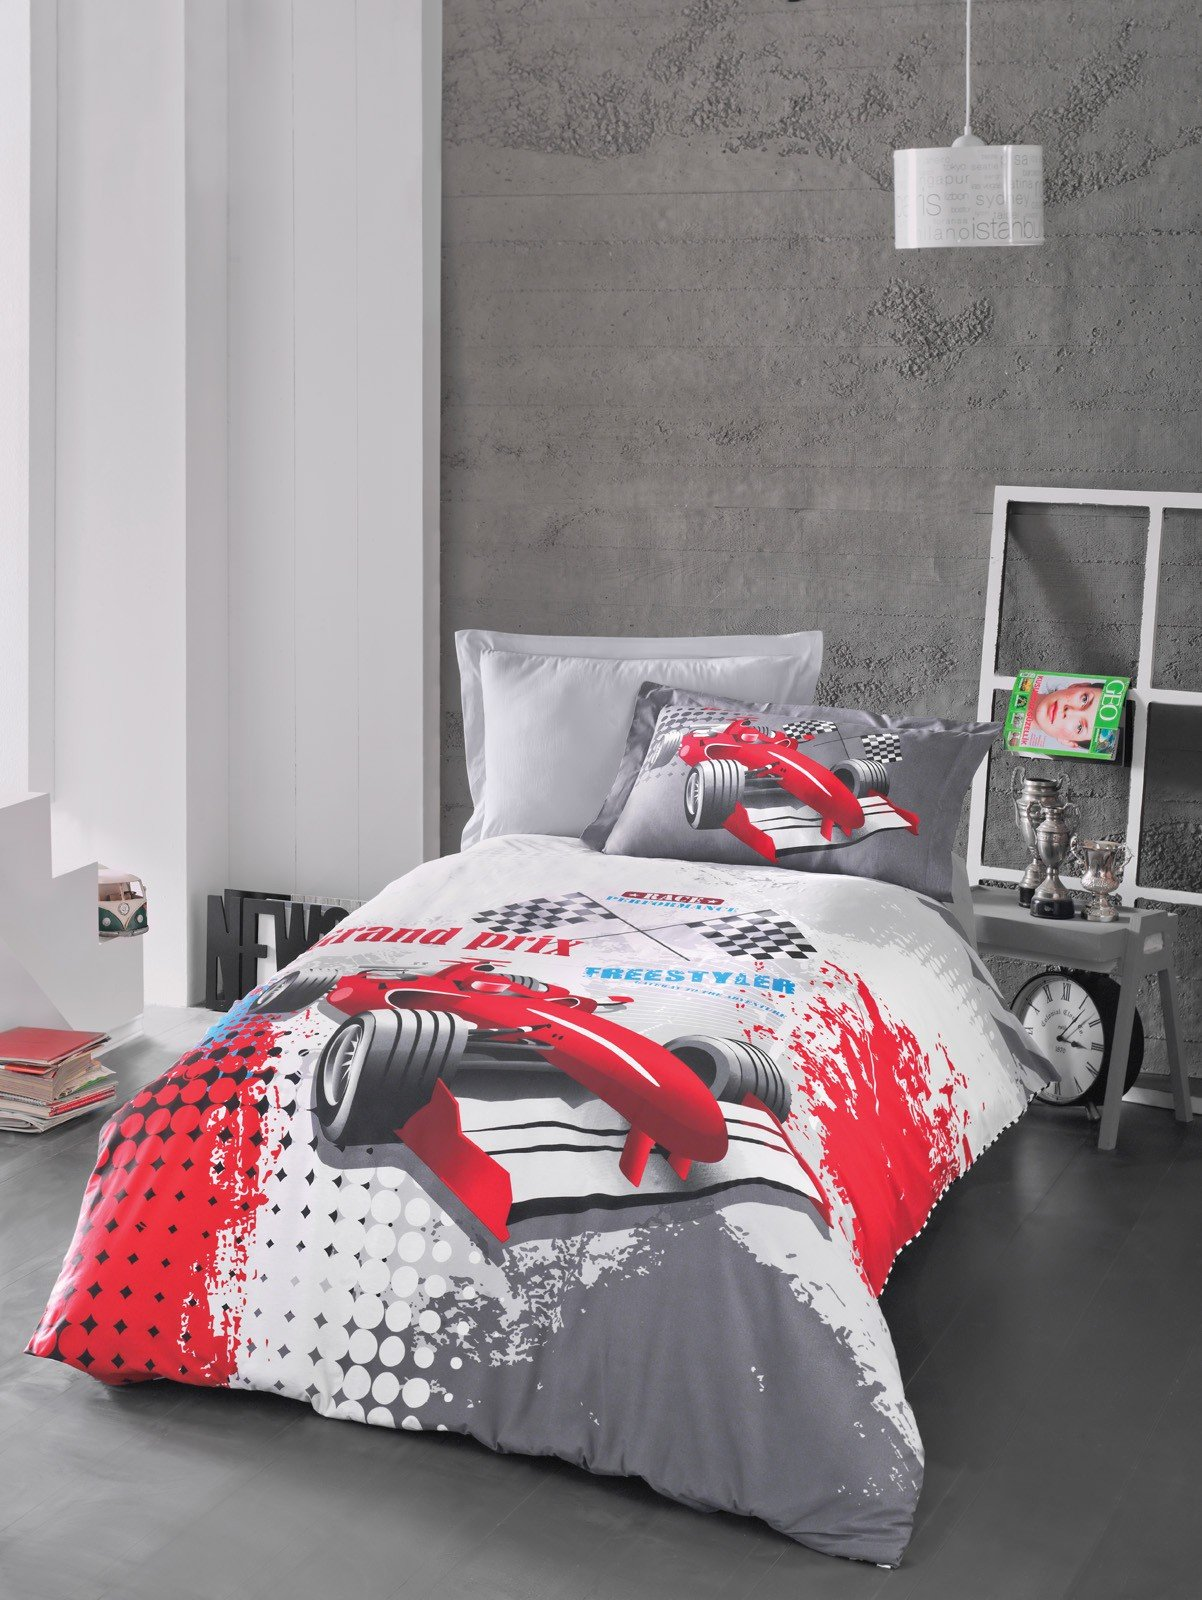 Bekata Grand Prix, 100% Cotton Kids Cars Bedding Quilt/Duvet Cover Set, Boy's Bedding Linens, Generic Formula 1 Racing Car Illustration, Single/Twin Size, (3 PCS)